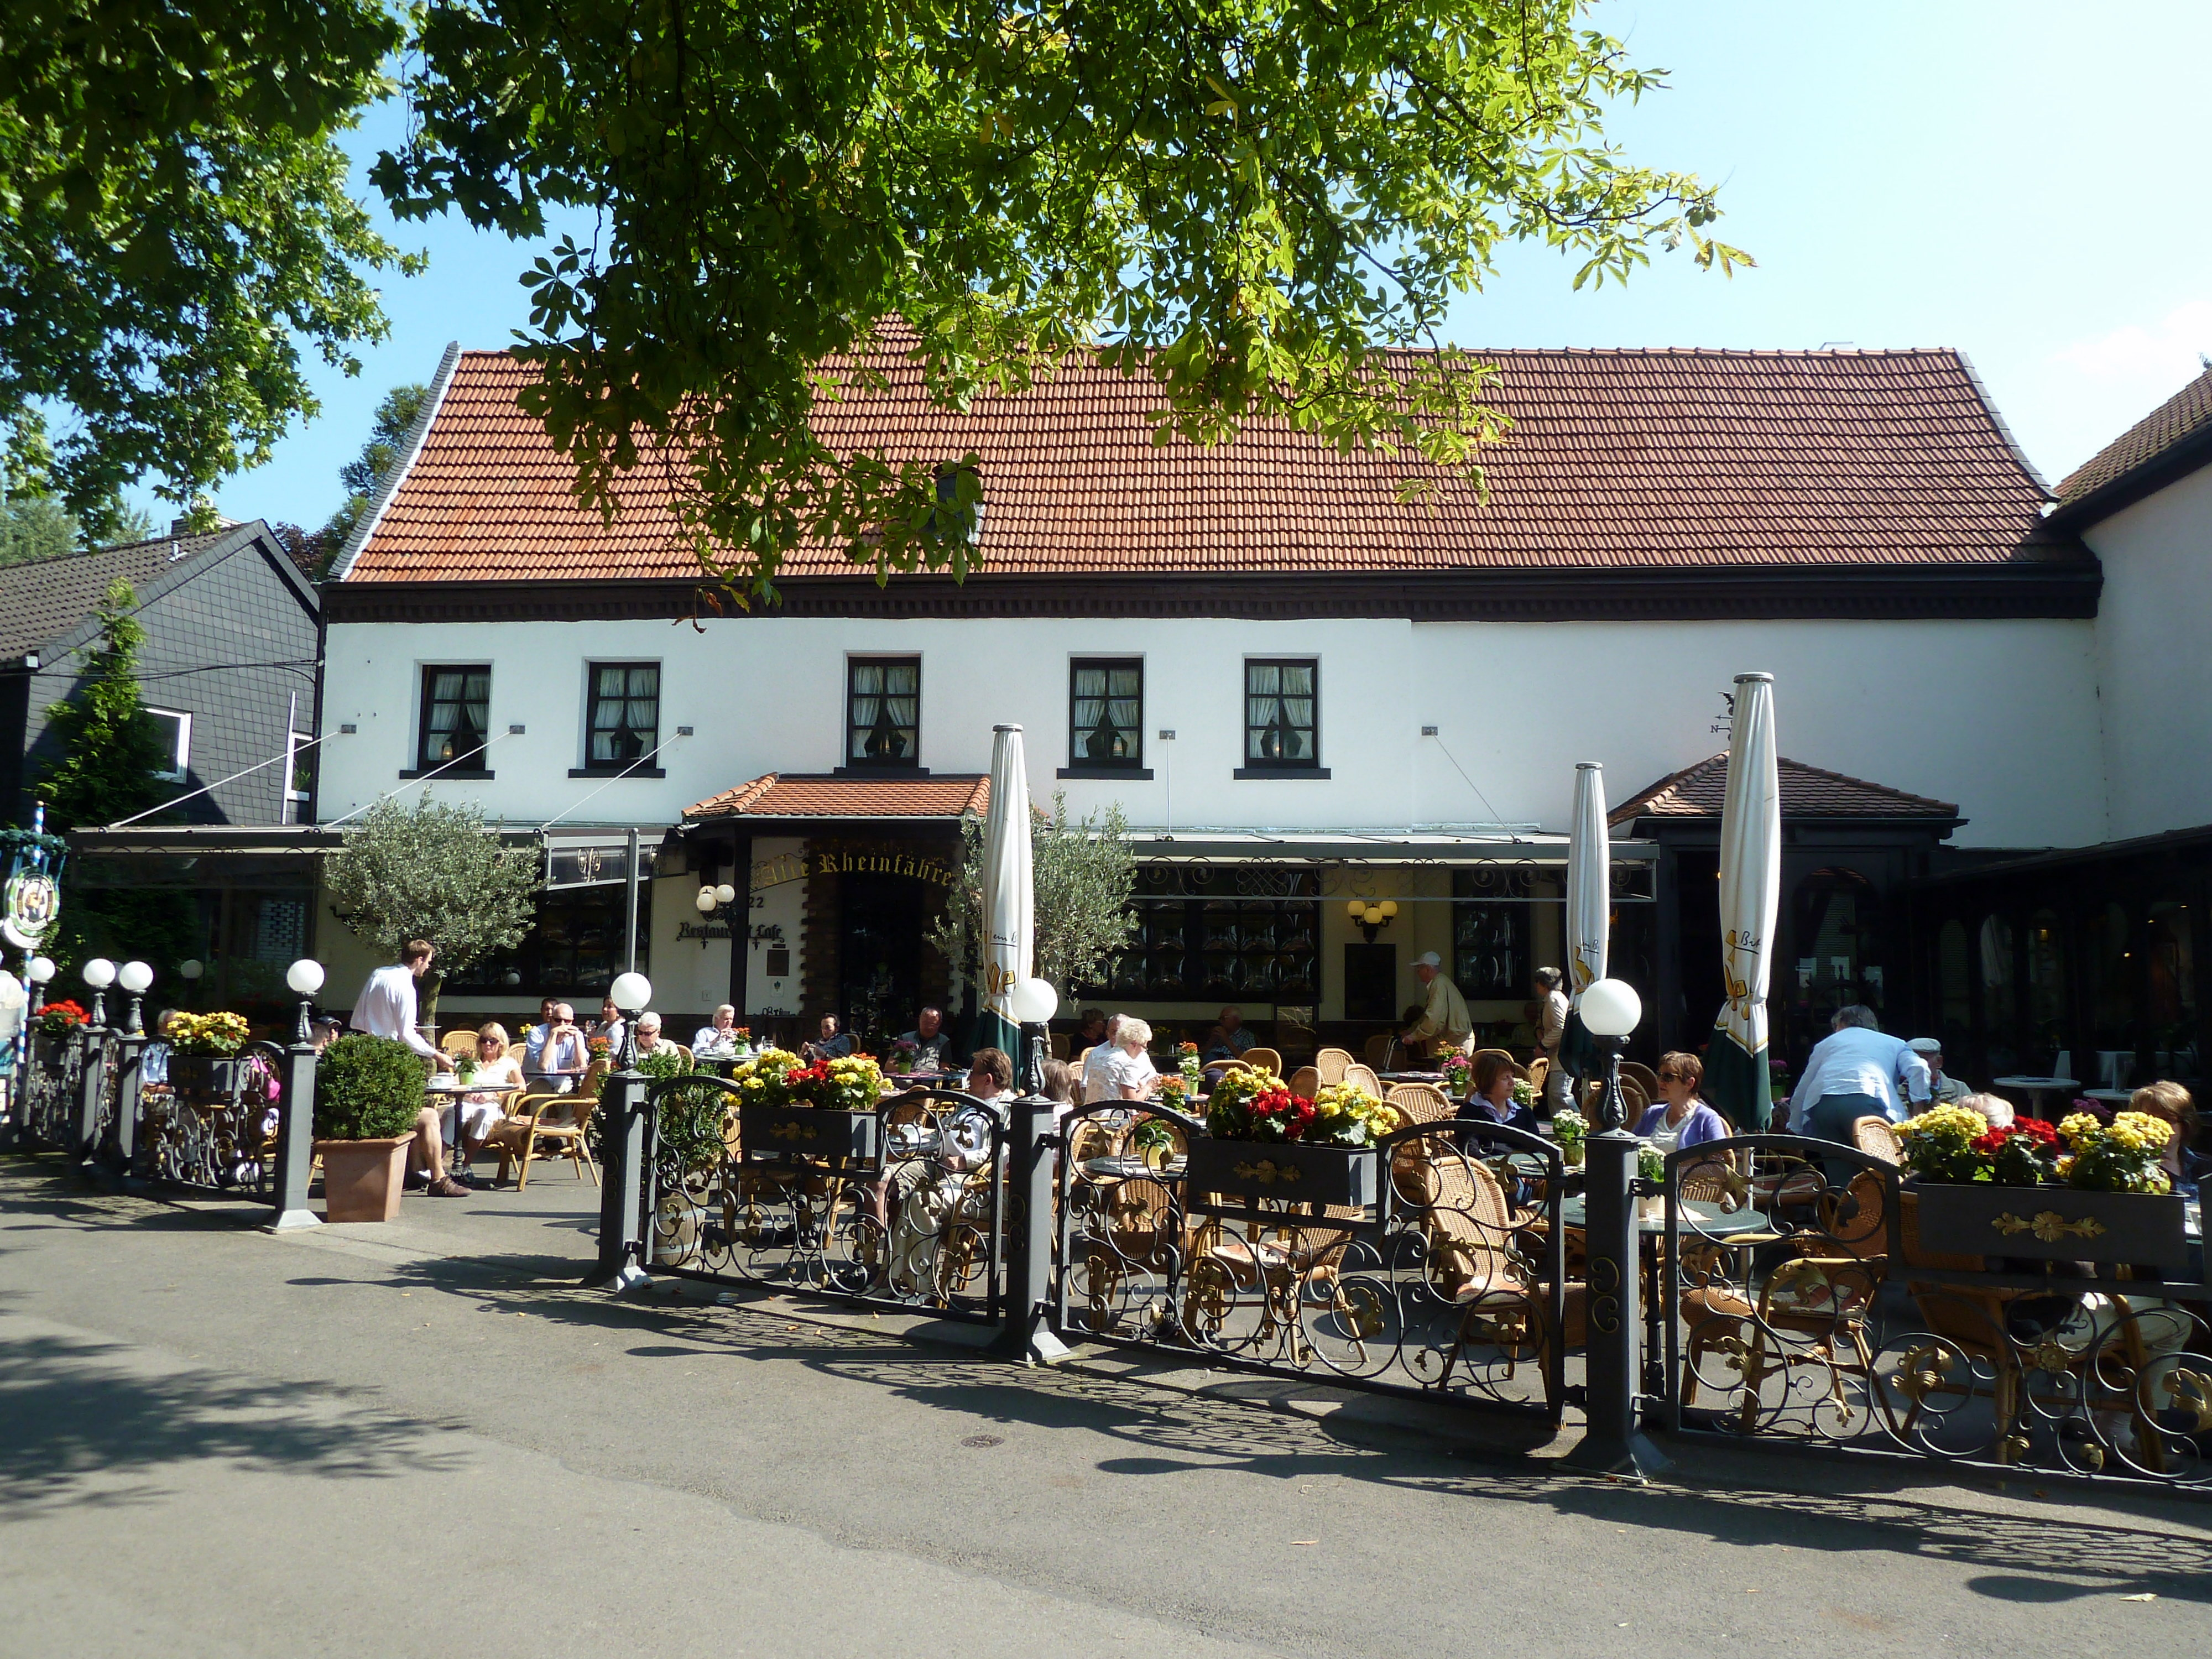 Restaurant Düsseldorf Kaiserswerth file cafe restaurant alte rheinfähre in kaiserswerth panoramio